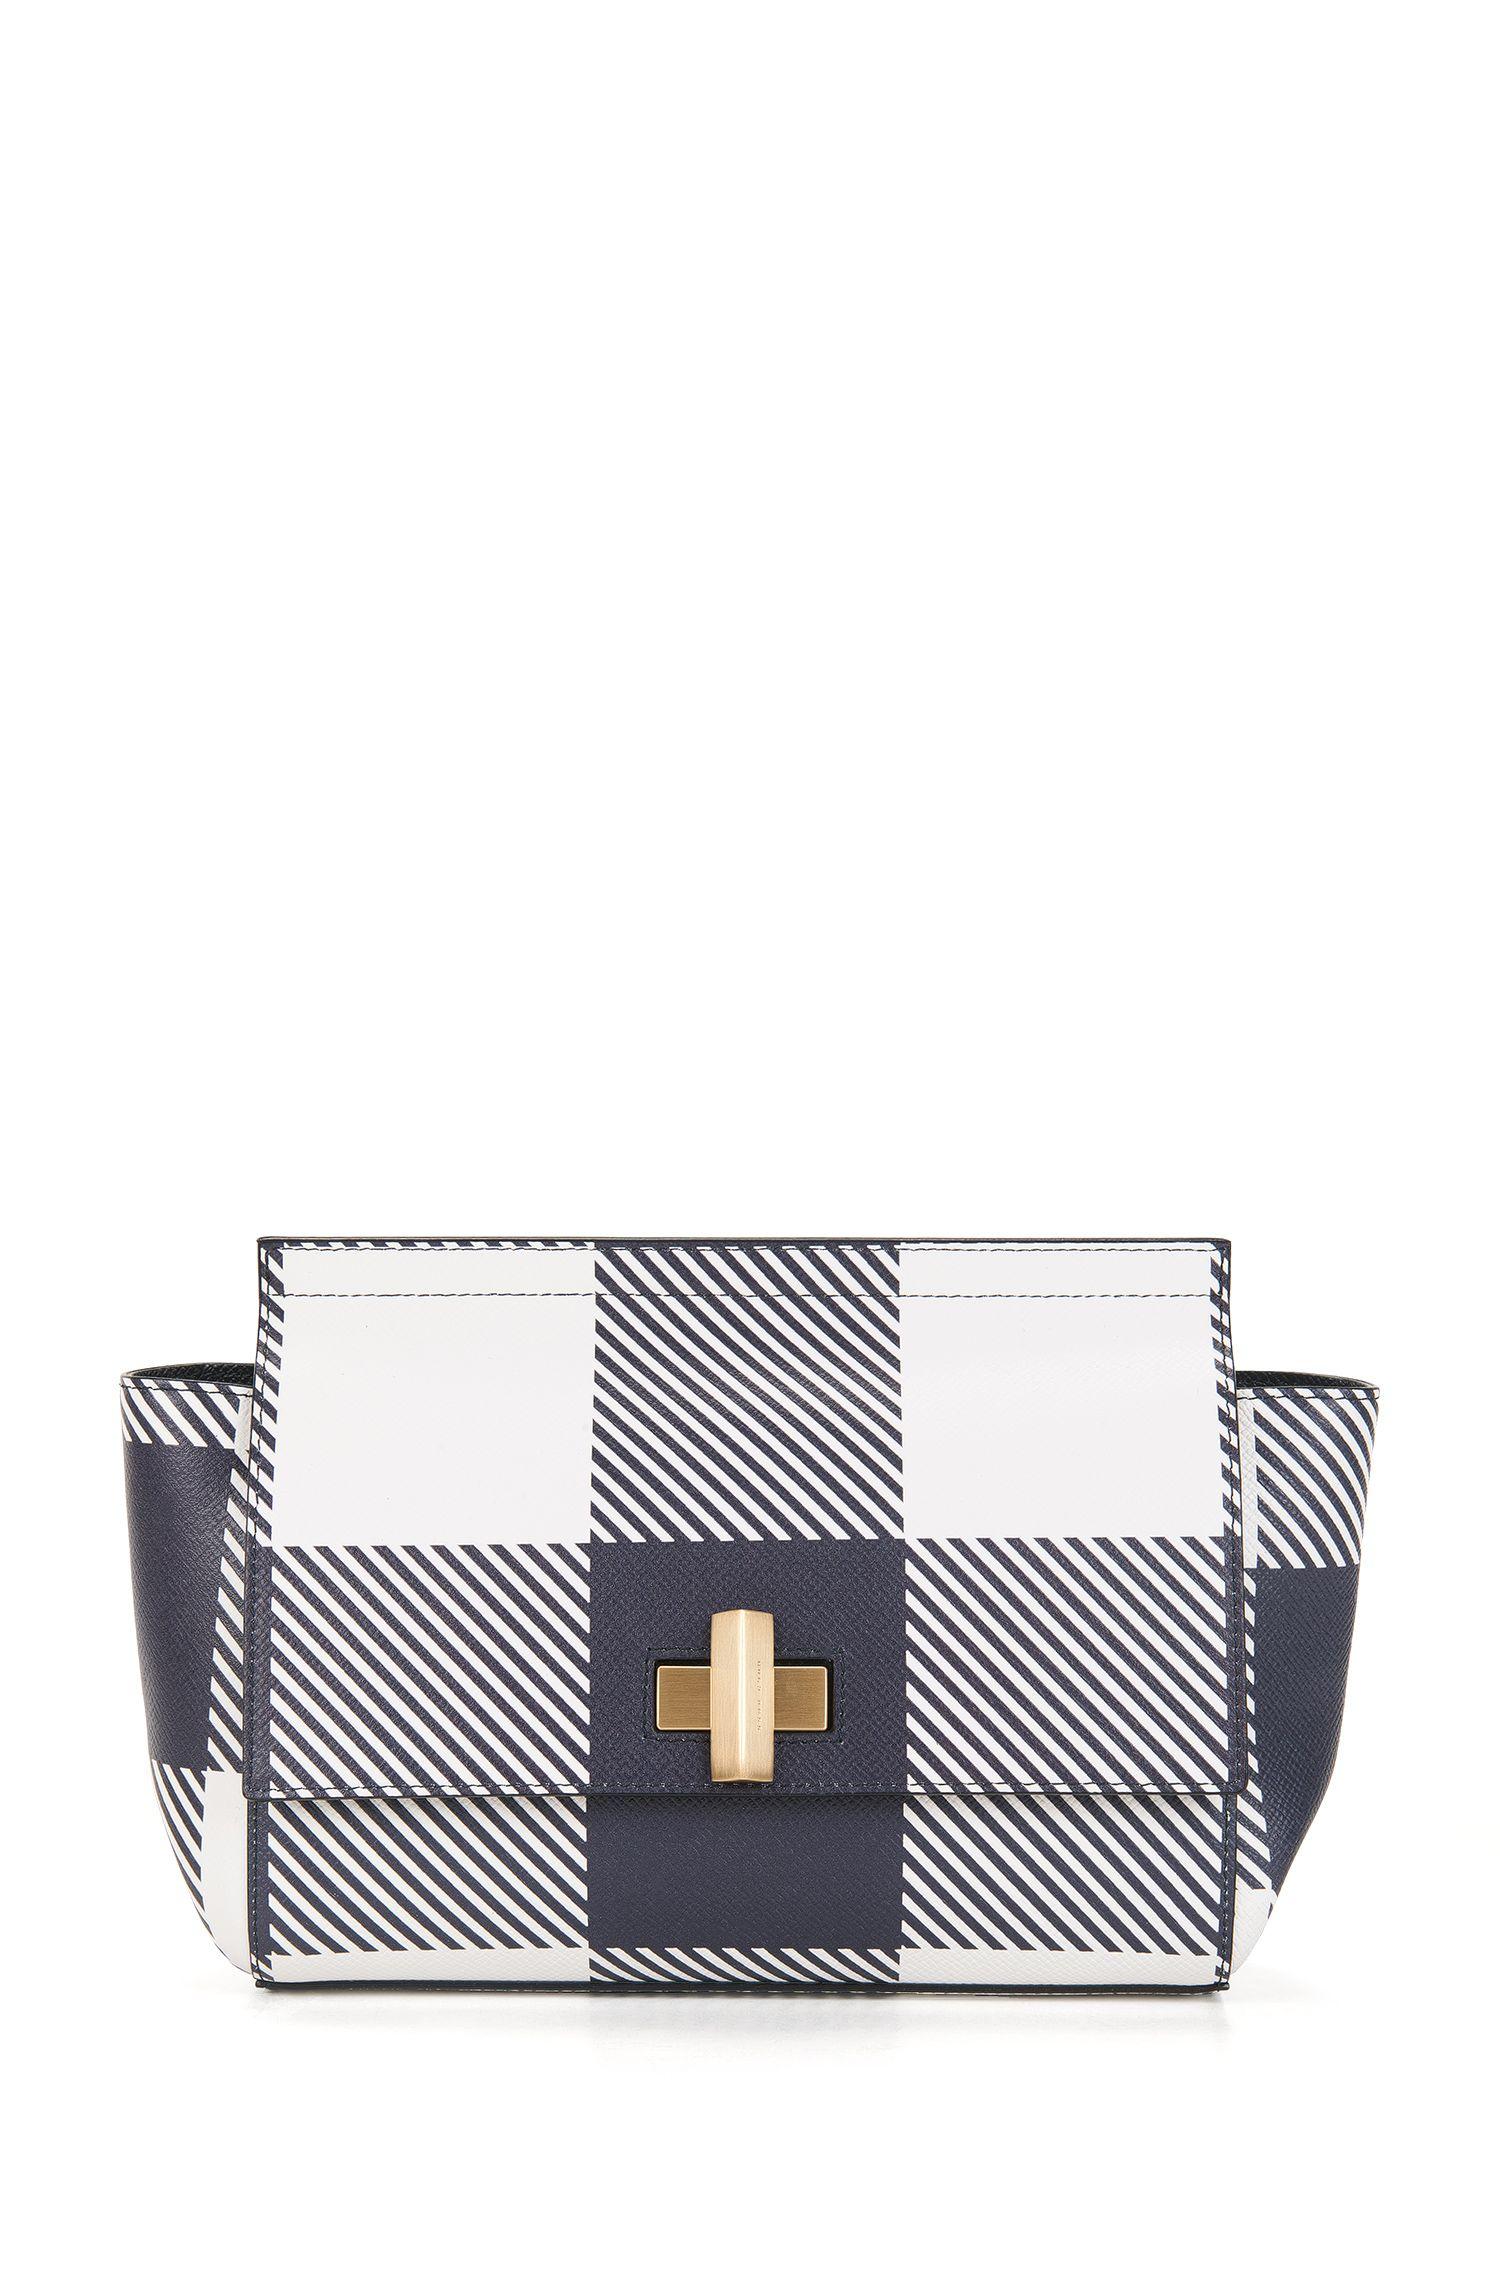 BOSS Bespoke Bag aus italienischem Leder mit Print